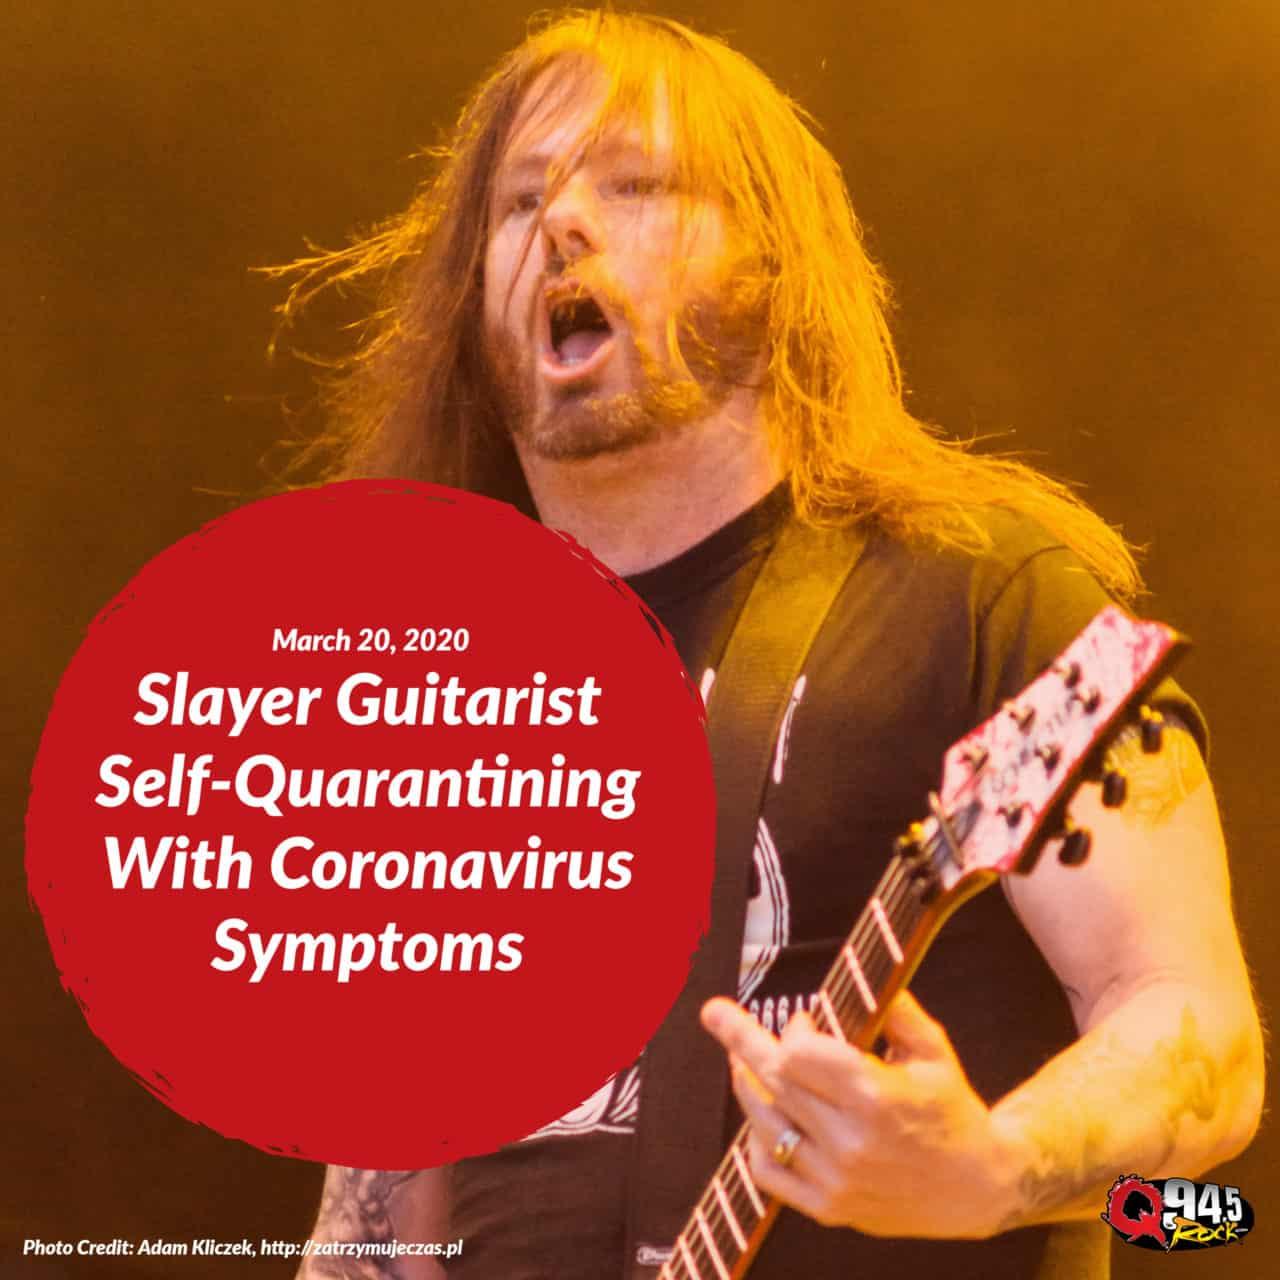 Slayer Guitarist Self-Quarantining With Coronavirus Symptoms